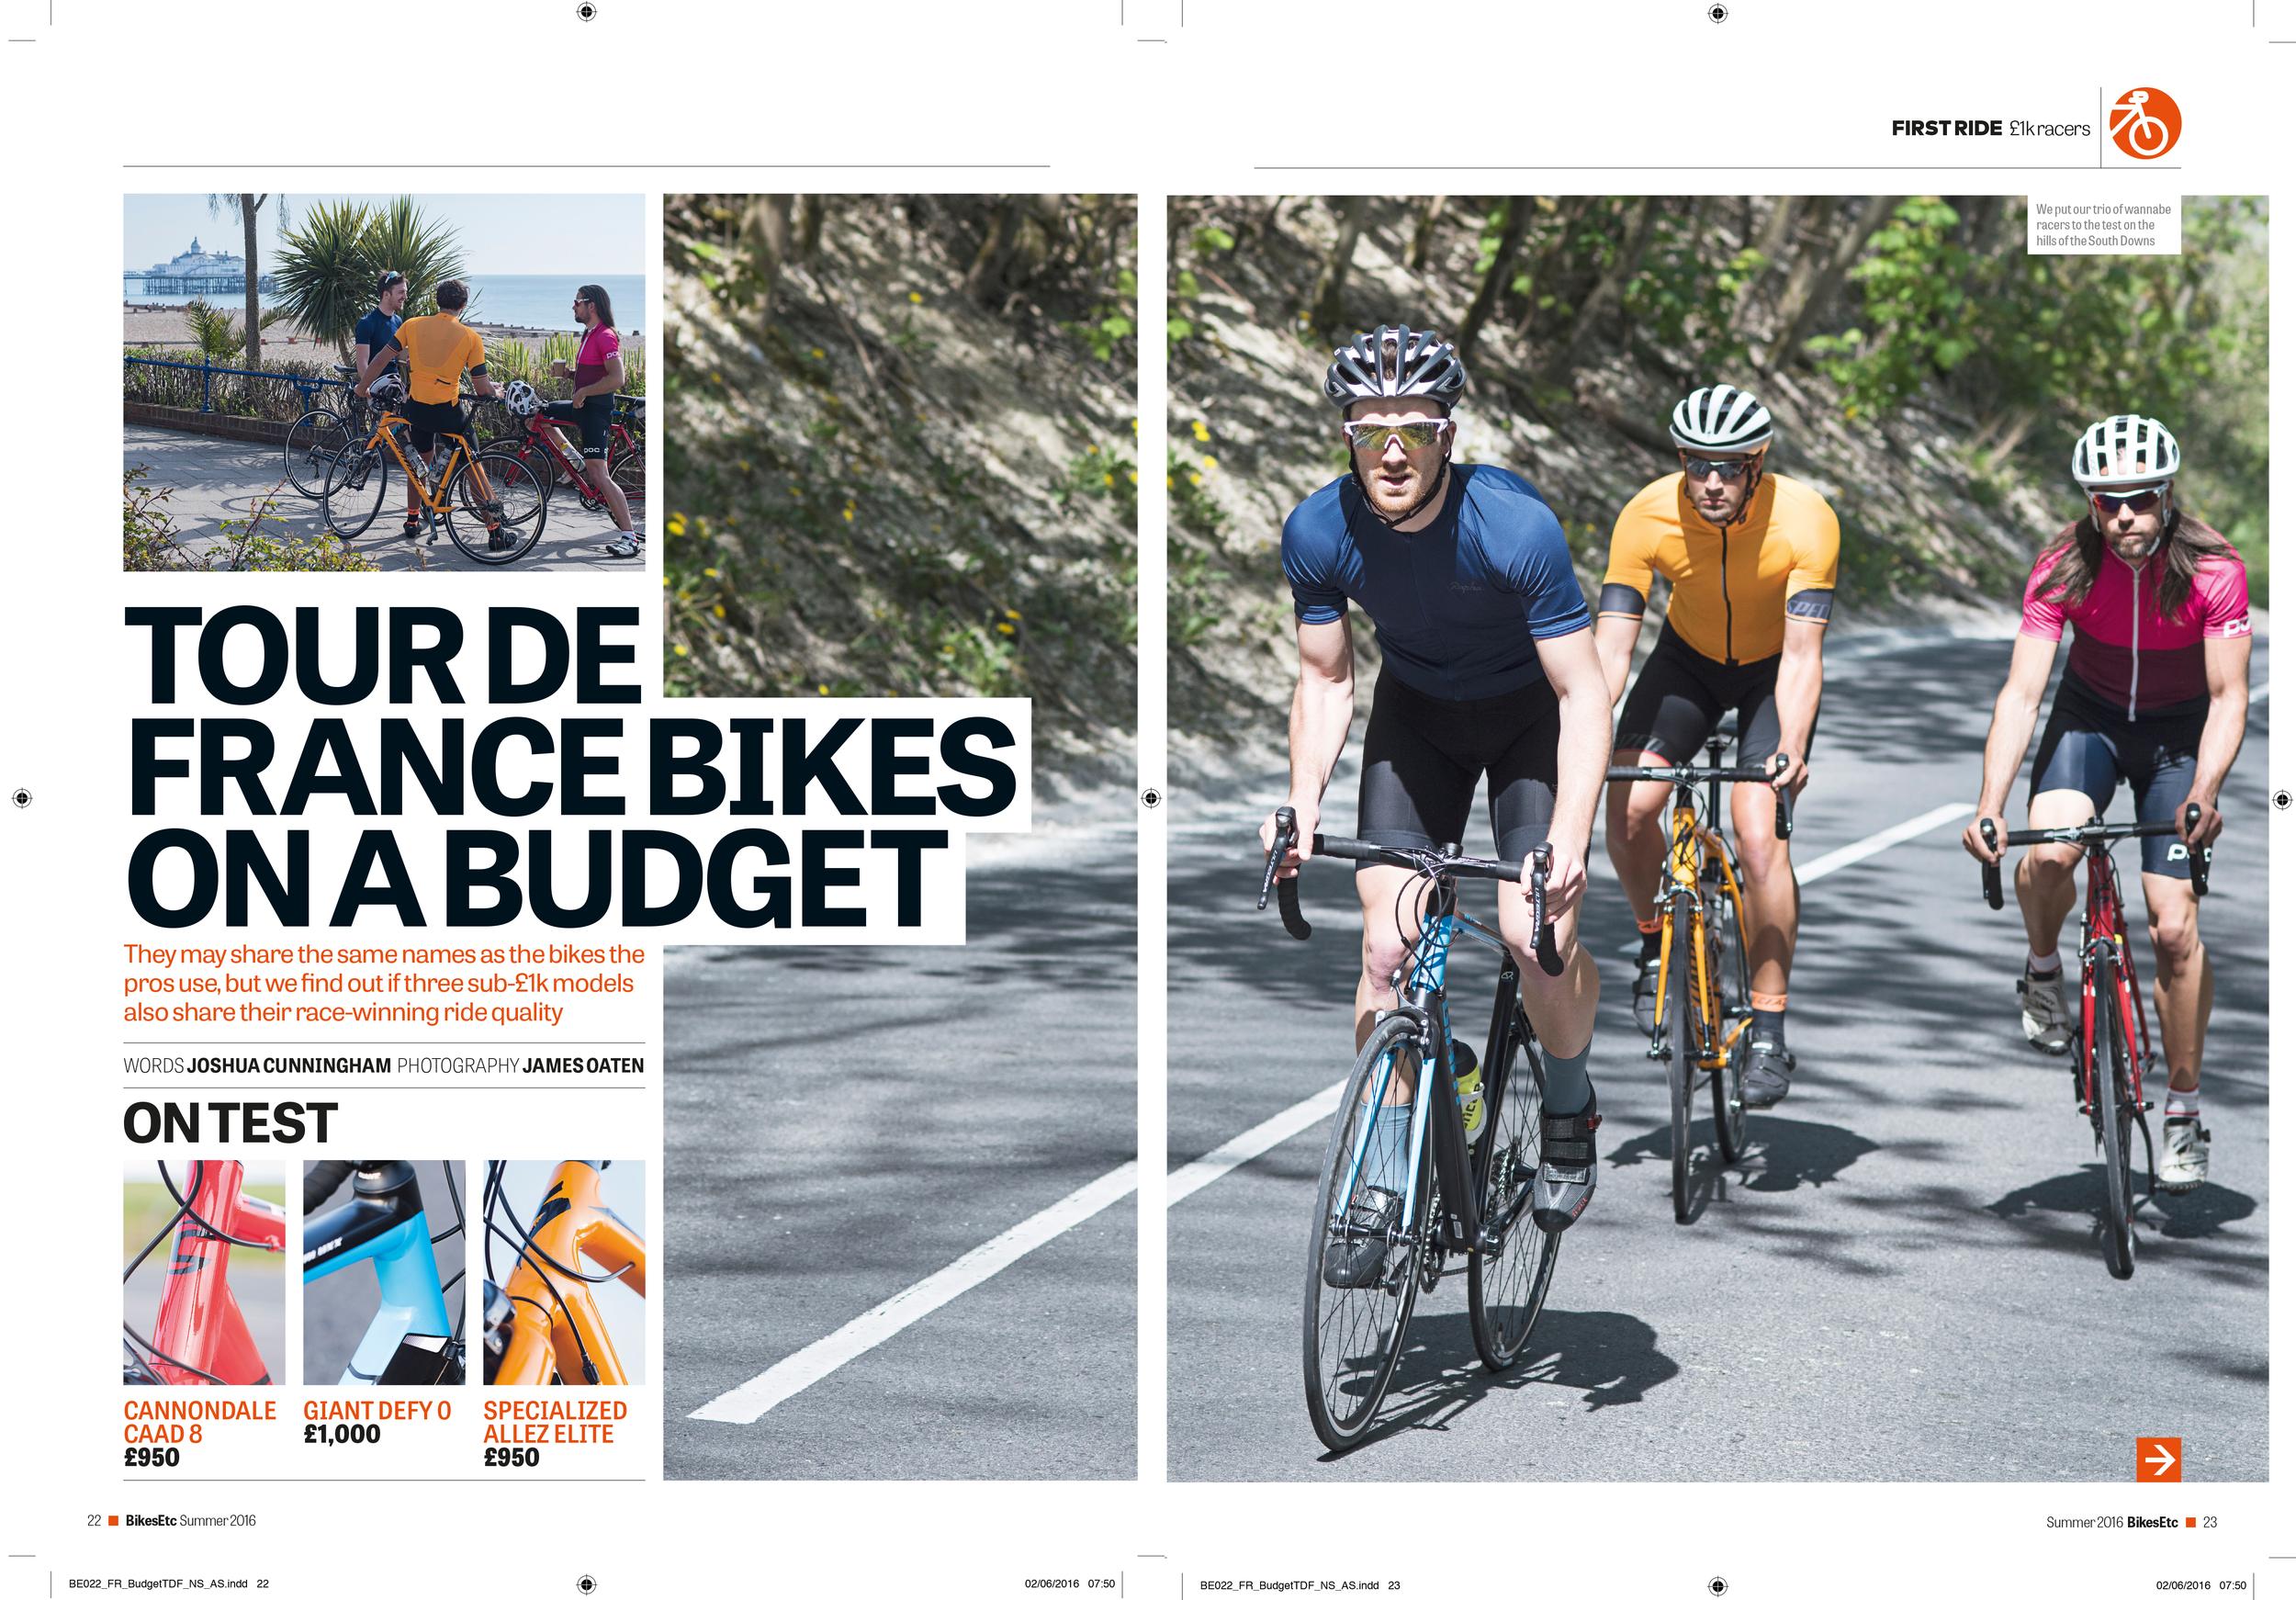 Budget Tour bikes test feature: Bikes Etc. Photography: James Oaten